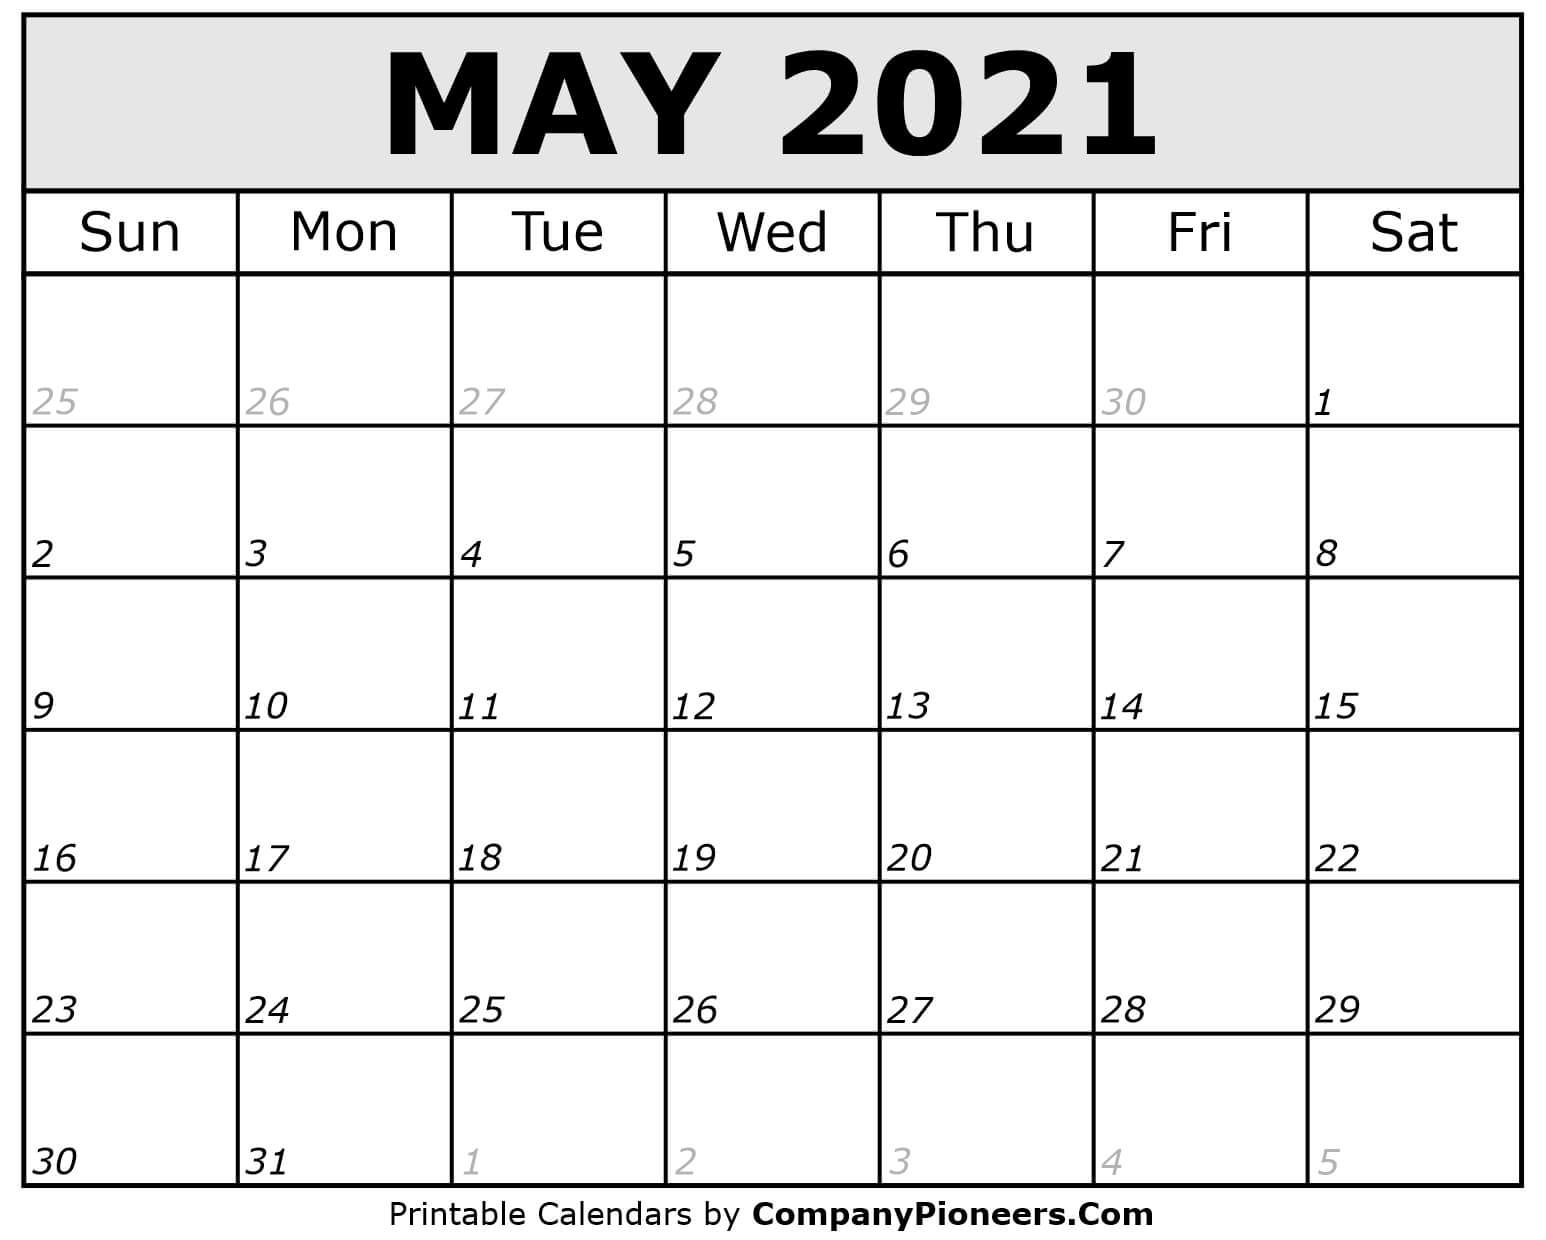 May 2021 Calendar Printable - Printable 2020 Calendars May